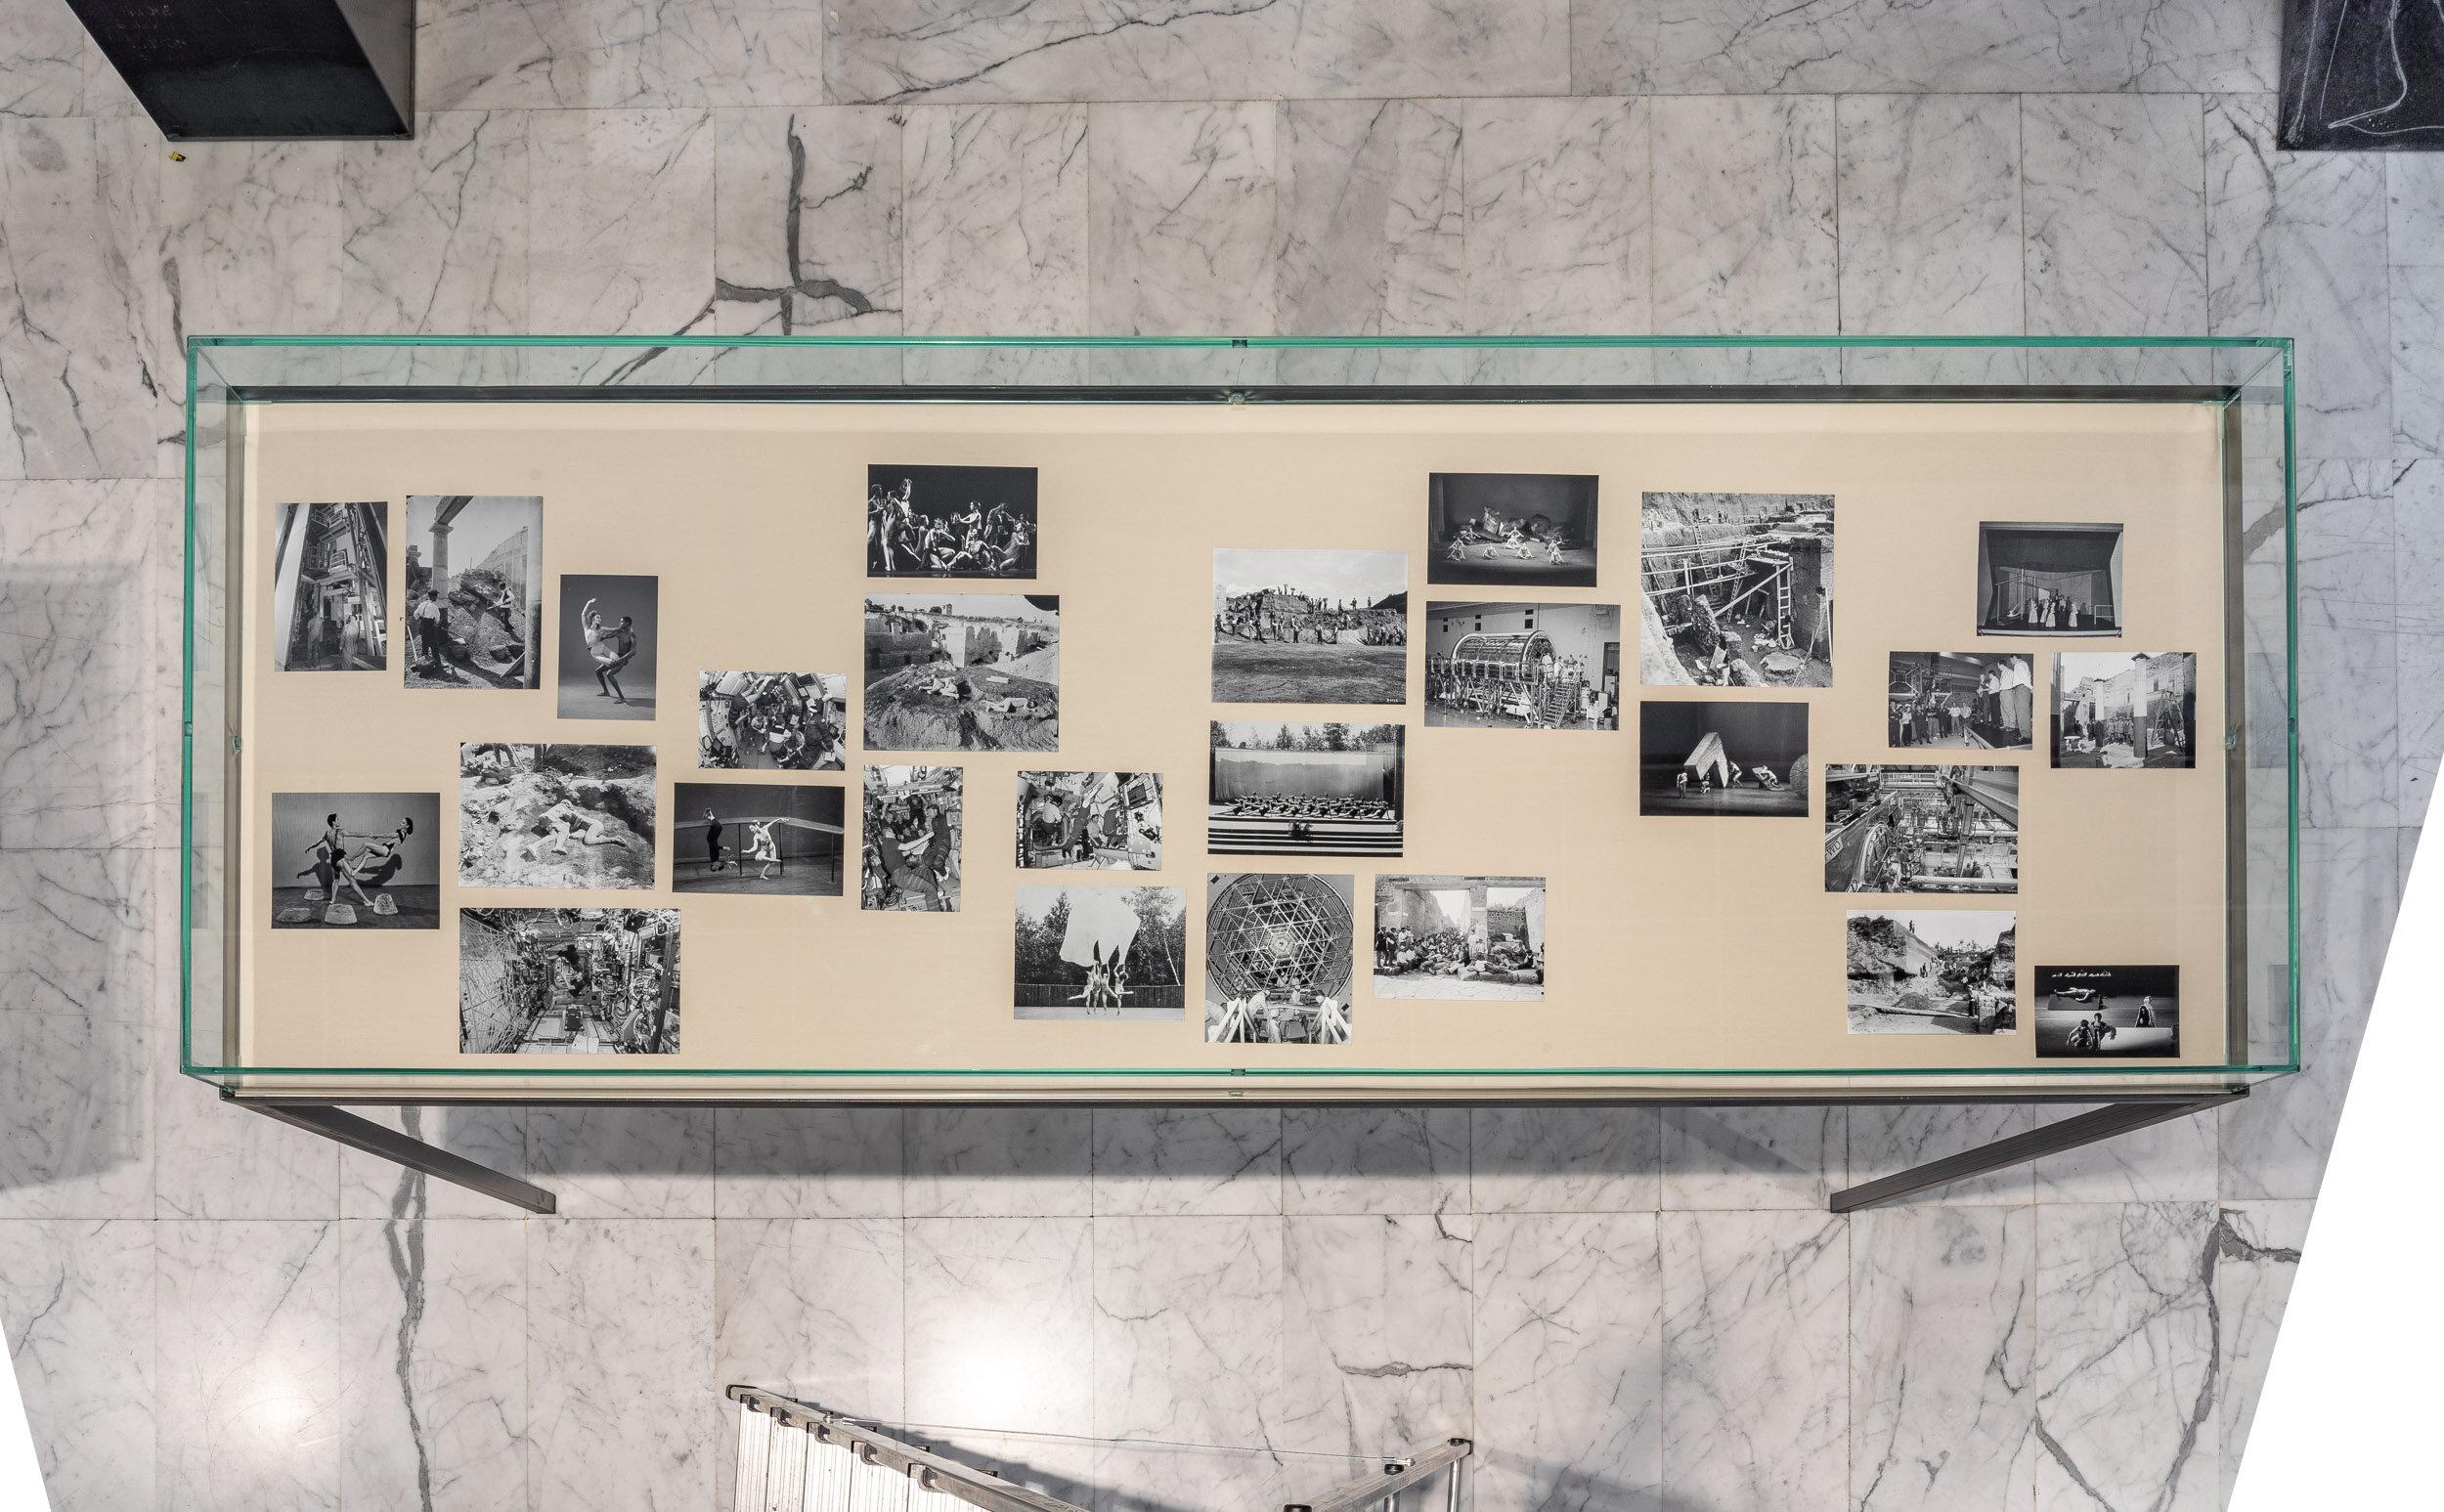 Attitude 1   Steel and glass vitrine, black and white photographs, fabric    100 x 210 x 75 cm    2019